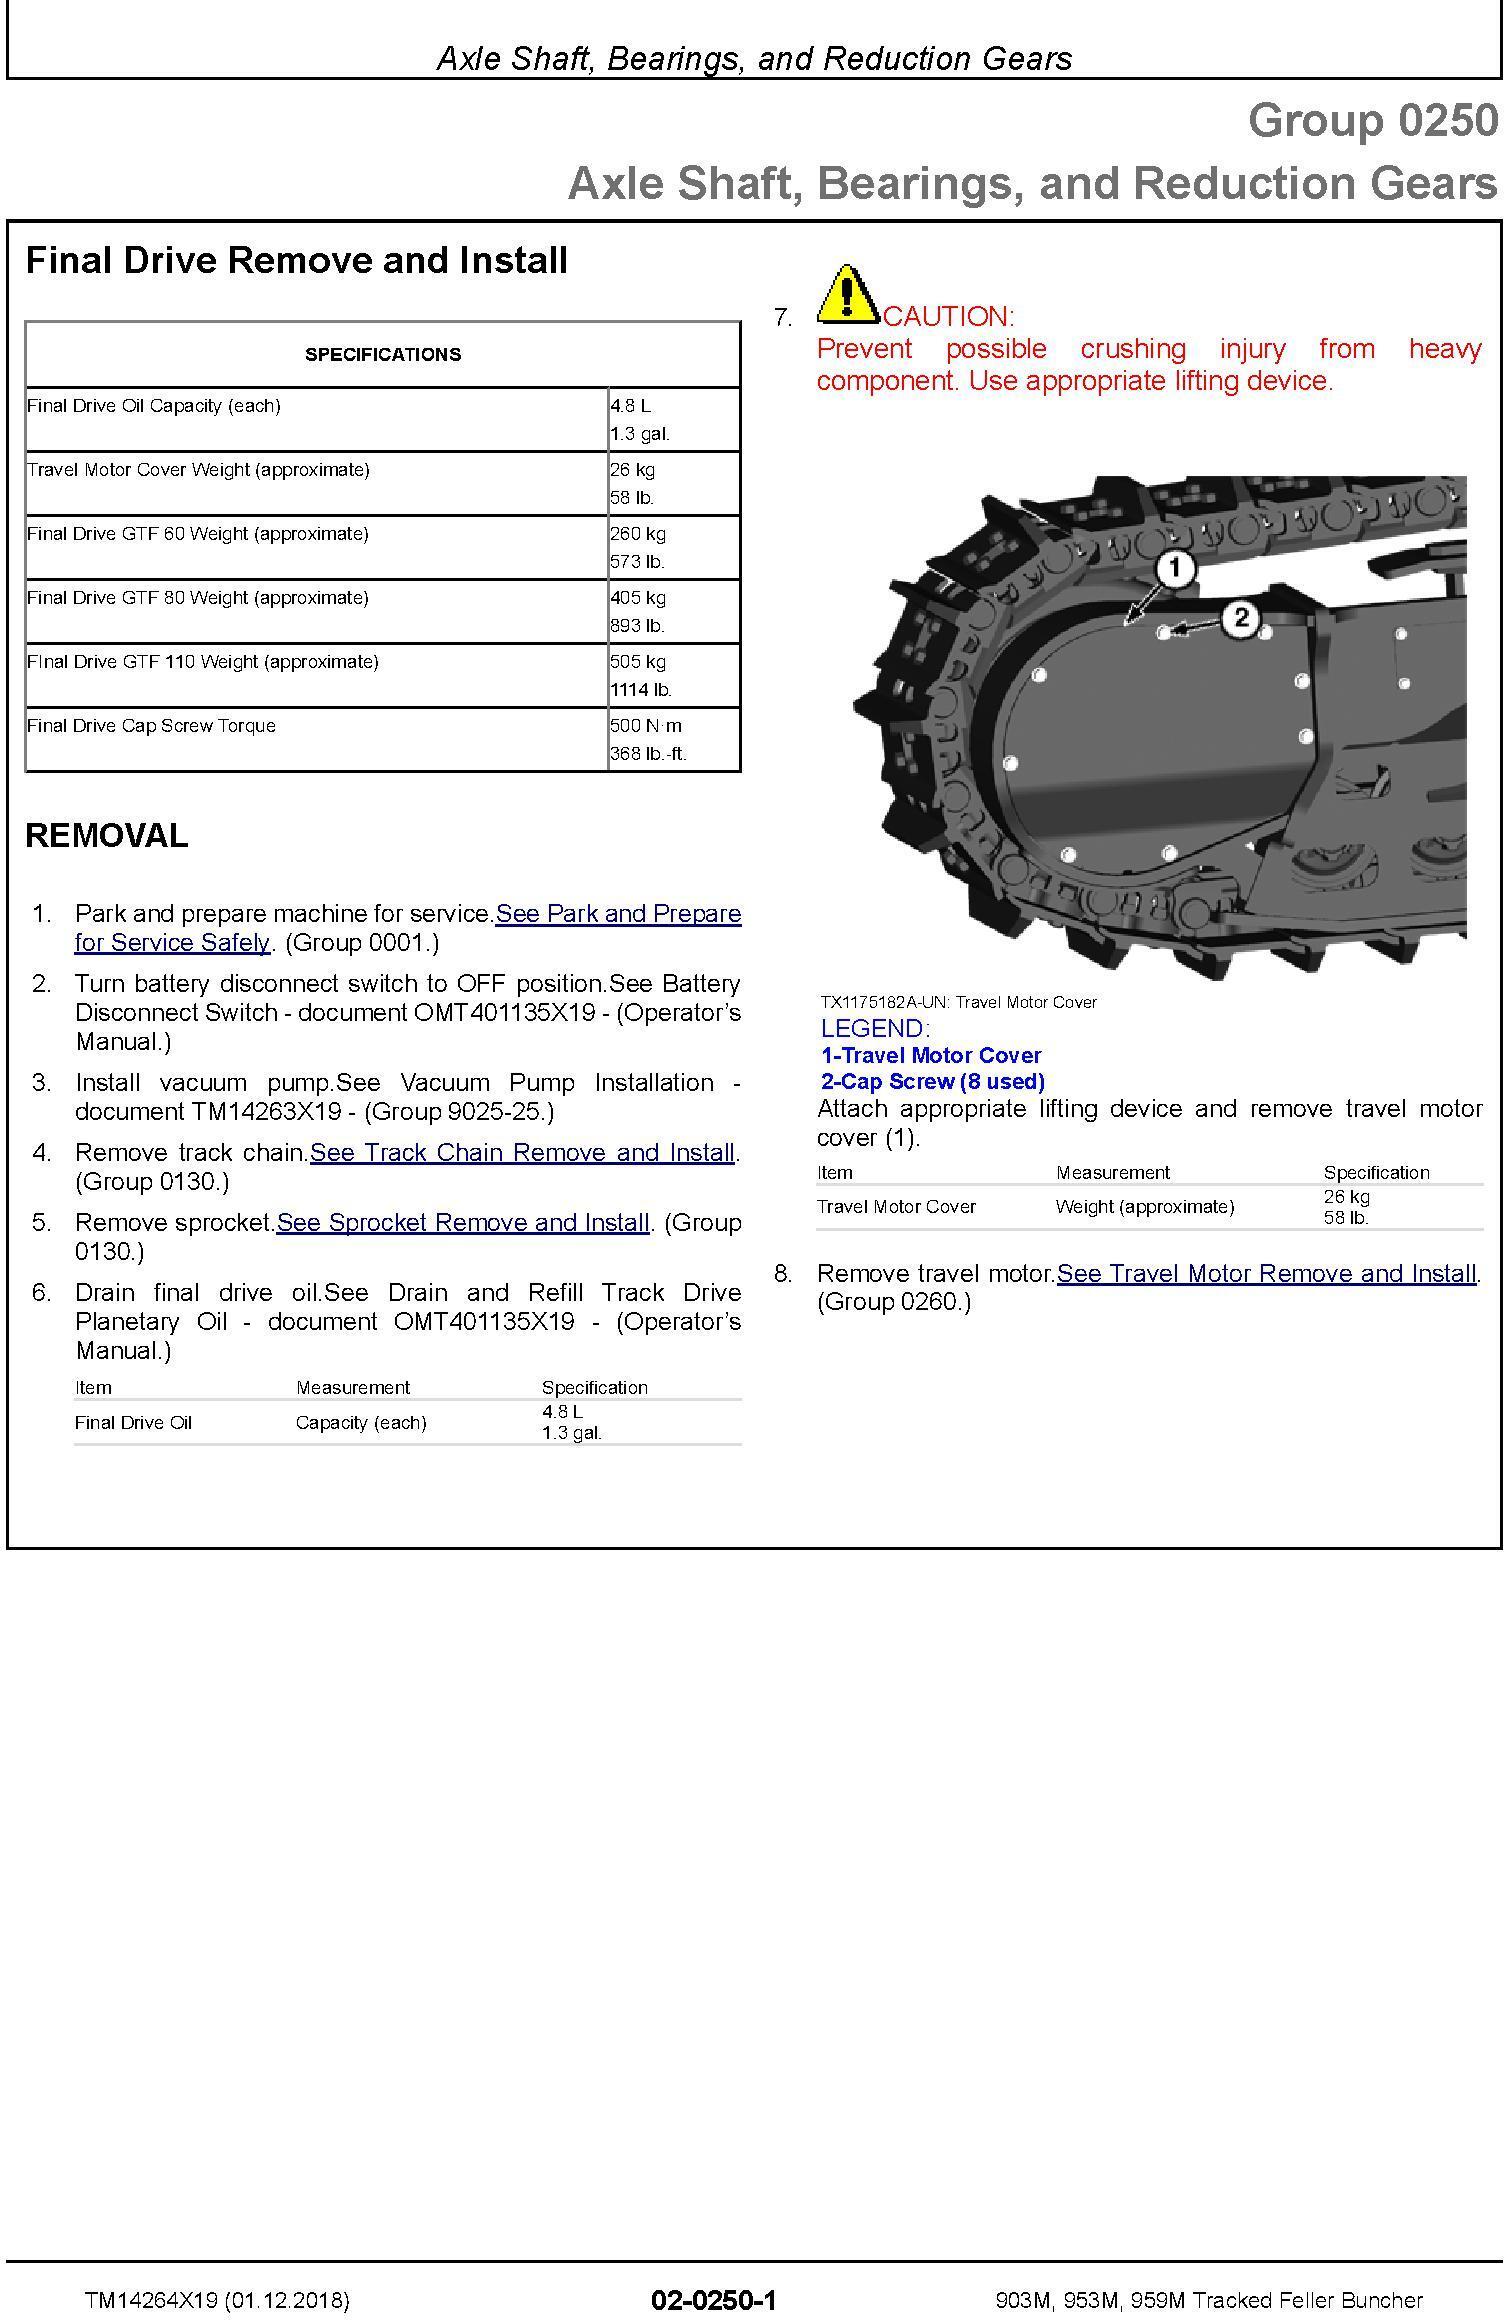 John Deere 903M, 953M, 959M (SN.C317982-,D317982-) Tracked